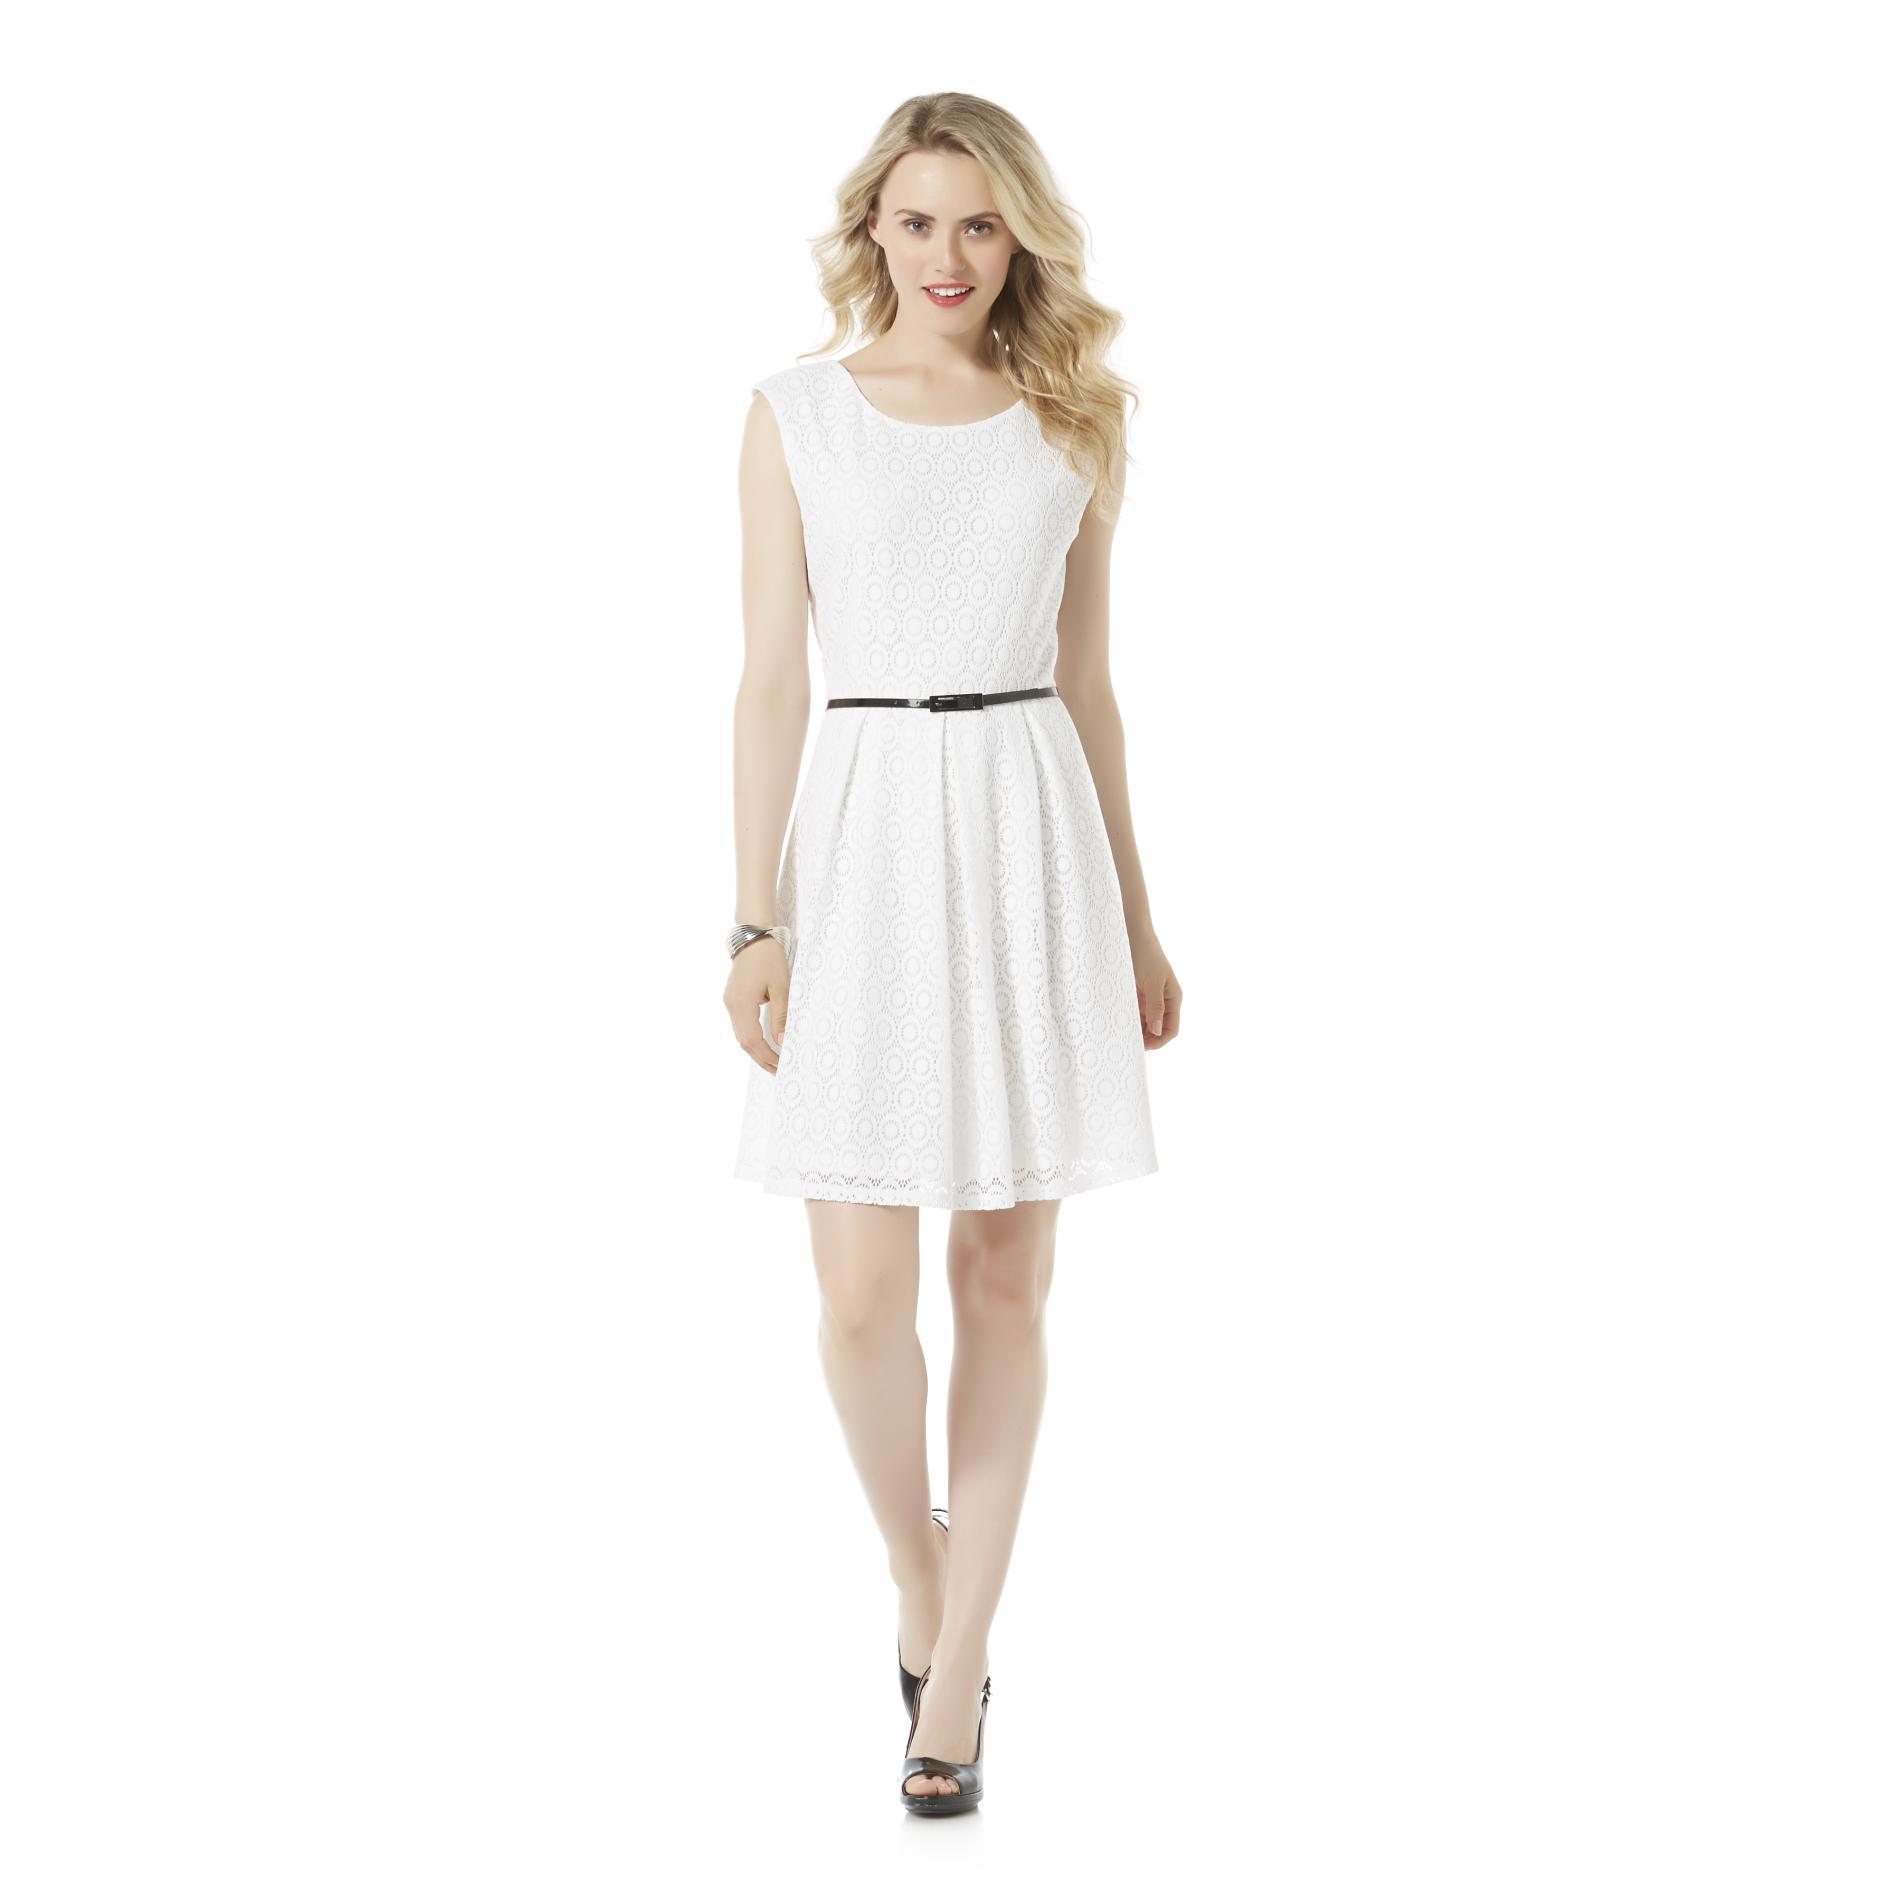 Metaphor Women's Sleeveless Lace Fit & Flare Dress & Belt